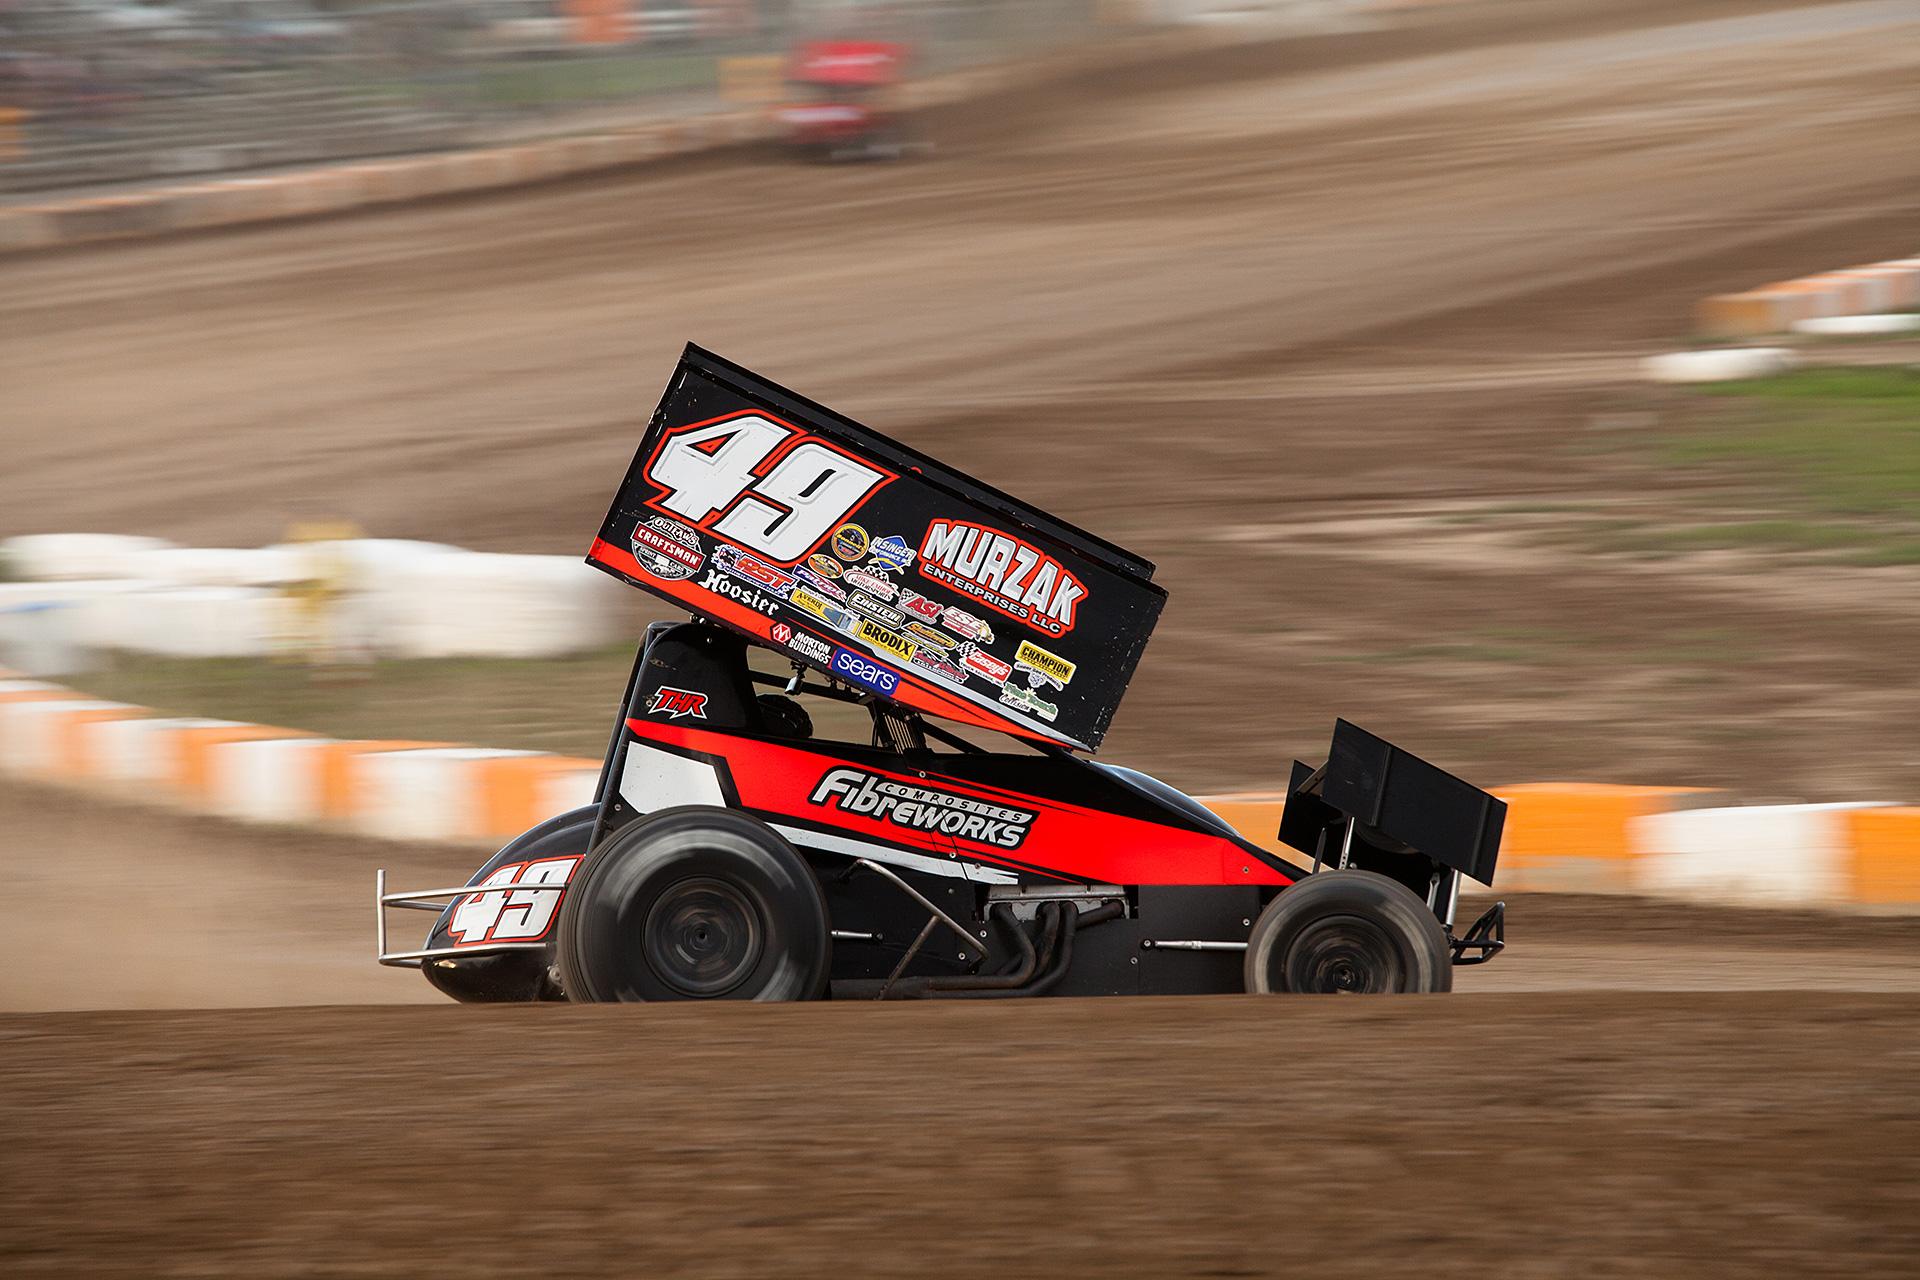 no.49 Scott Kreutter on the gas through turn 4 at Ohsweken Speedway ( Jeffrey Turford / TDP )